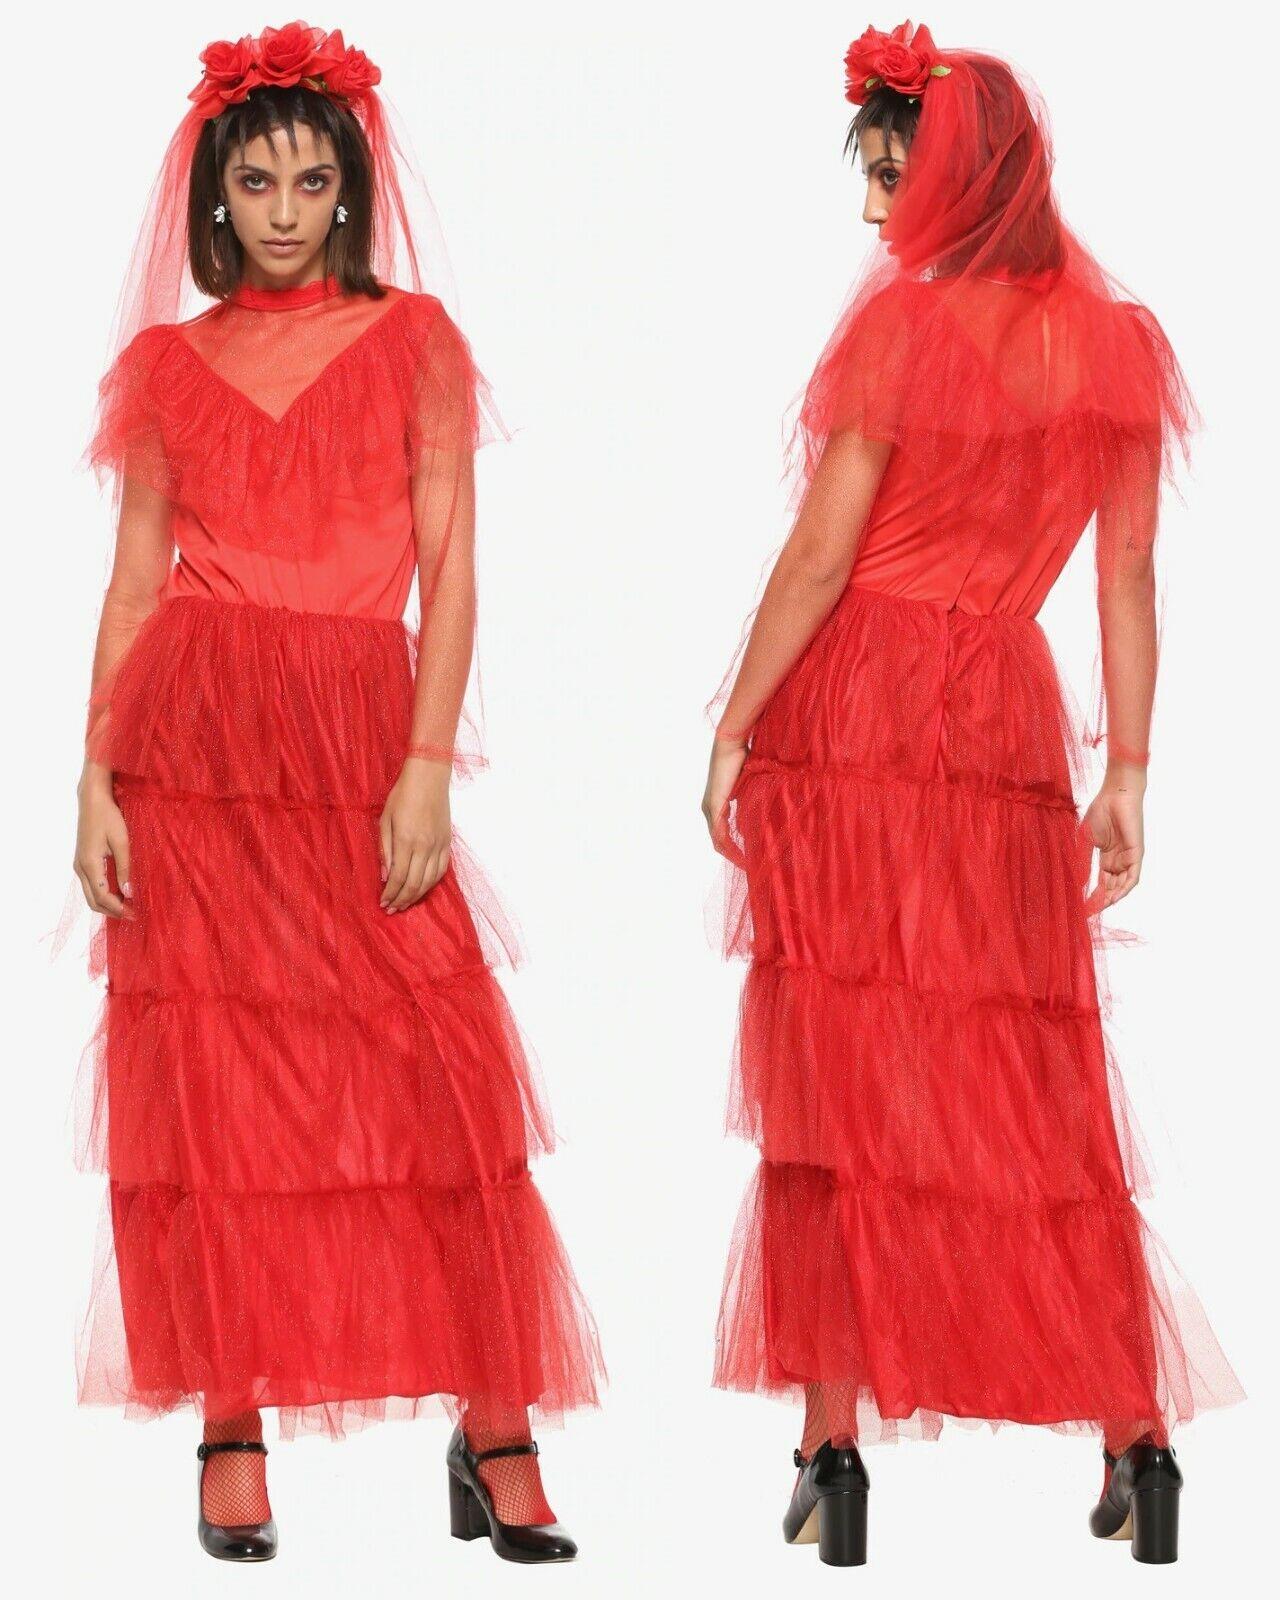 Beetle Bride Adult Womens Costume Beetlejuice Lydia Red Wedding Dress For Sale Online Ebay